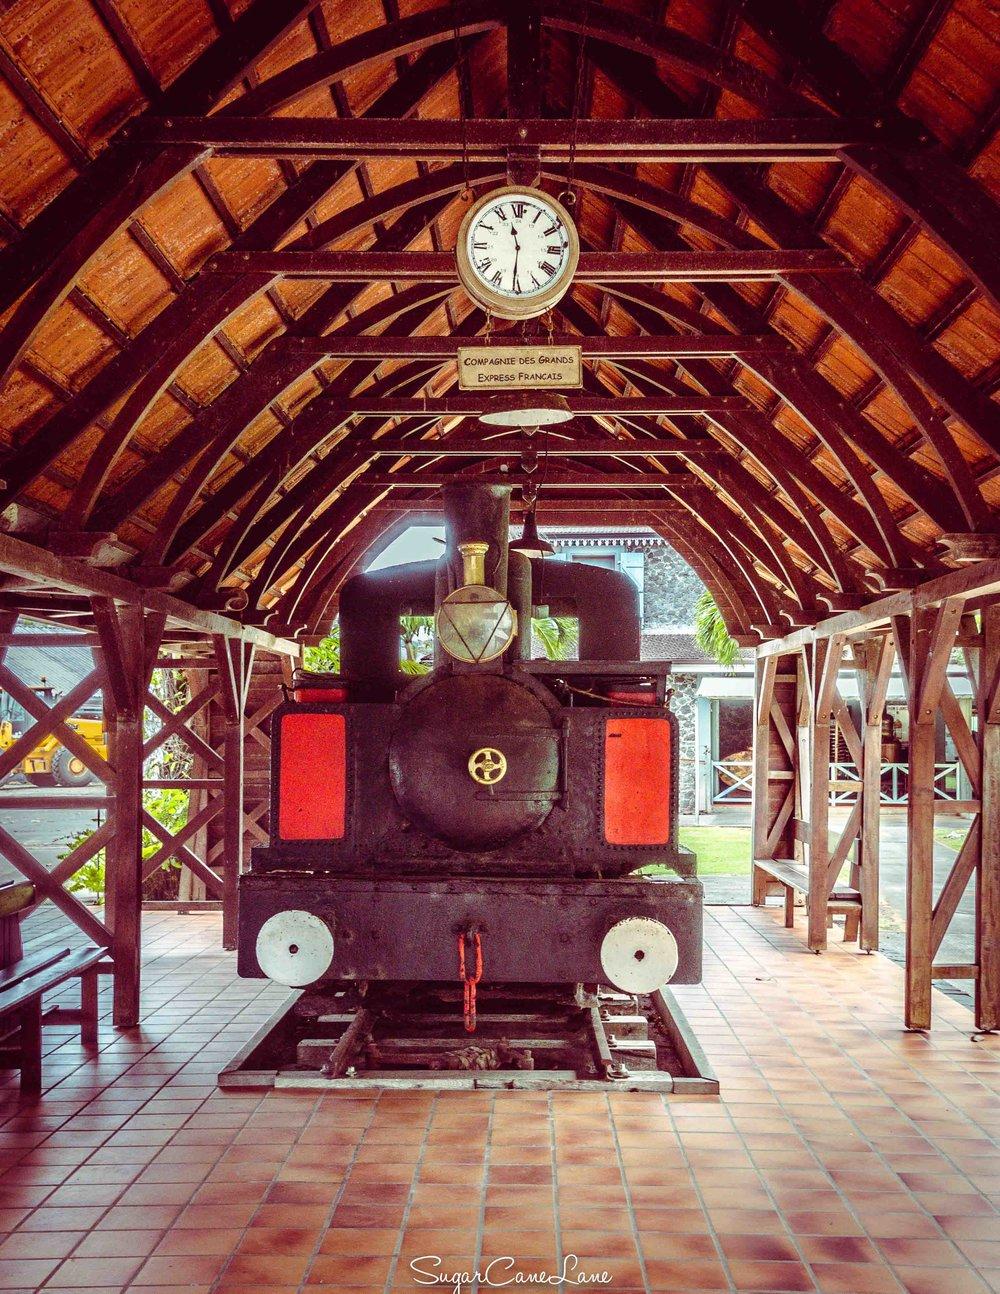 martinique_saint-james_train_1602.jpg